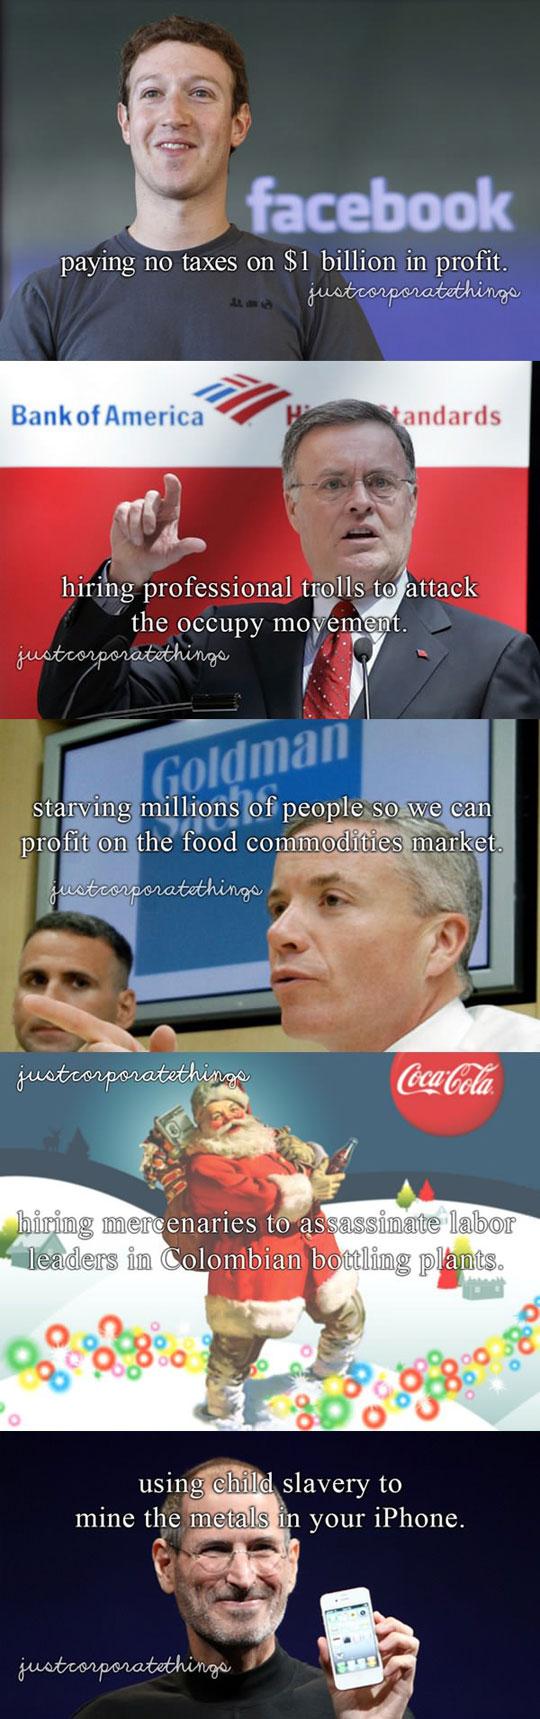 cool-corporate-Facebook-Bank-professional-secret